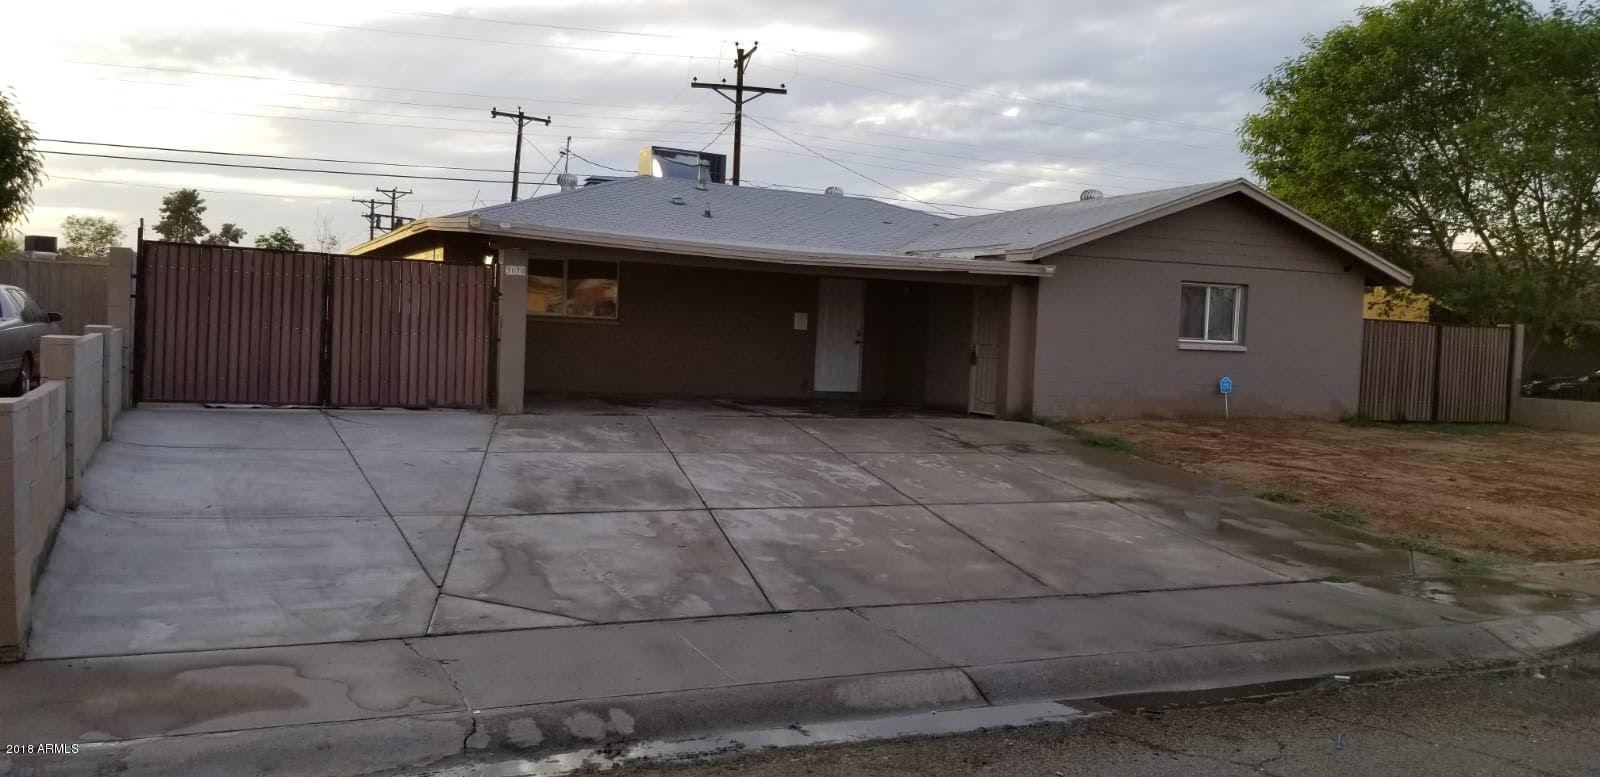 Photo of 3030 N 43RD Avenue, Phoenix, AZ 85031